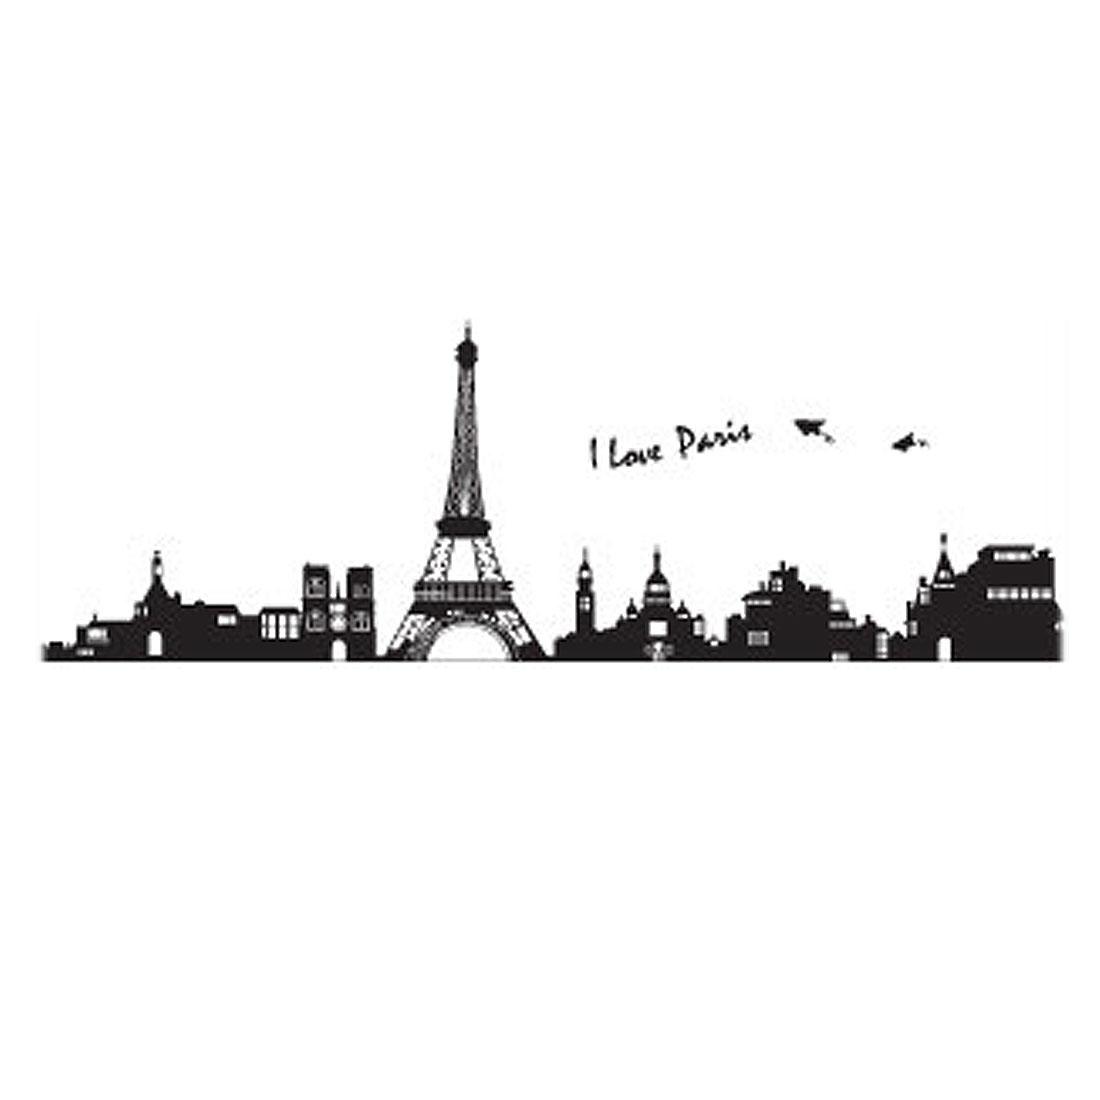 Paris Eiffel Tower Diy Home Room Decal Wall Decor Sticker